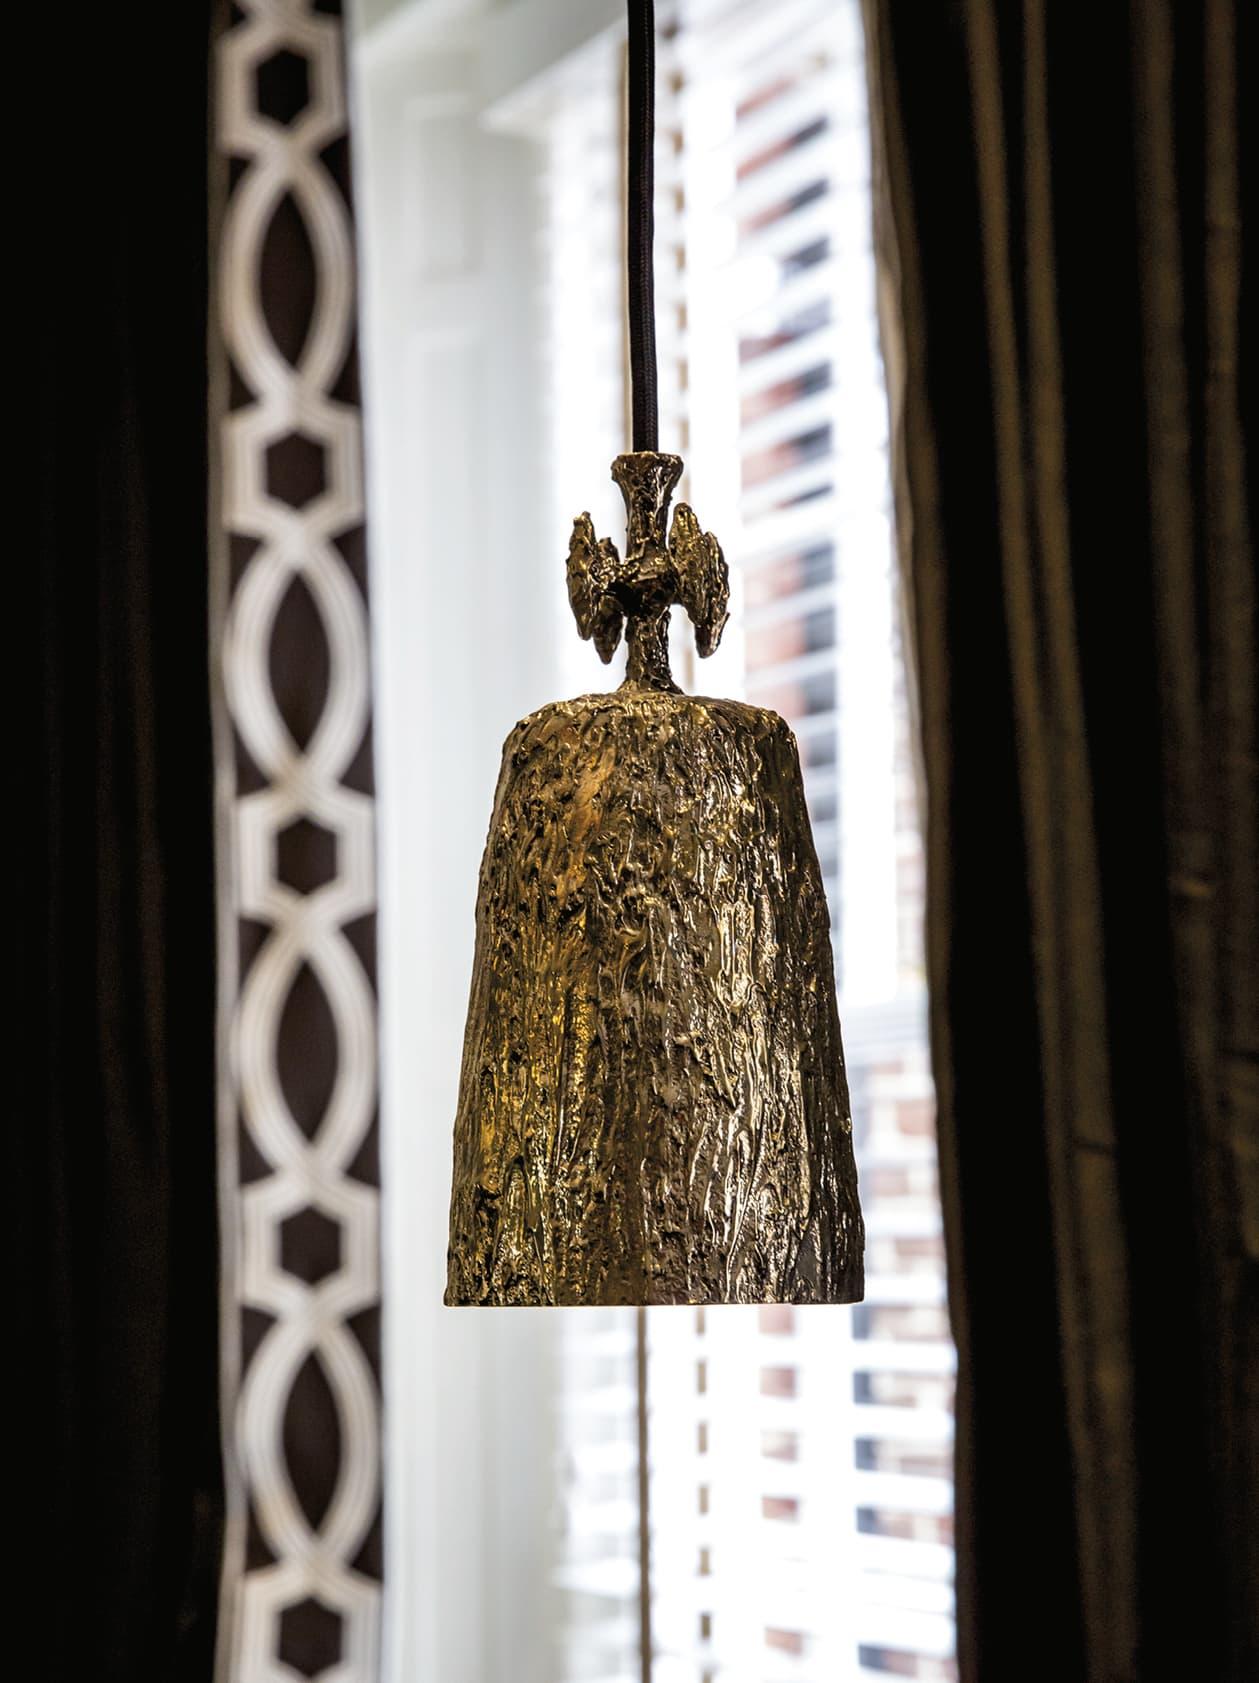 Closeup of a decorative light